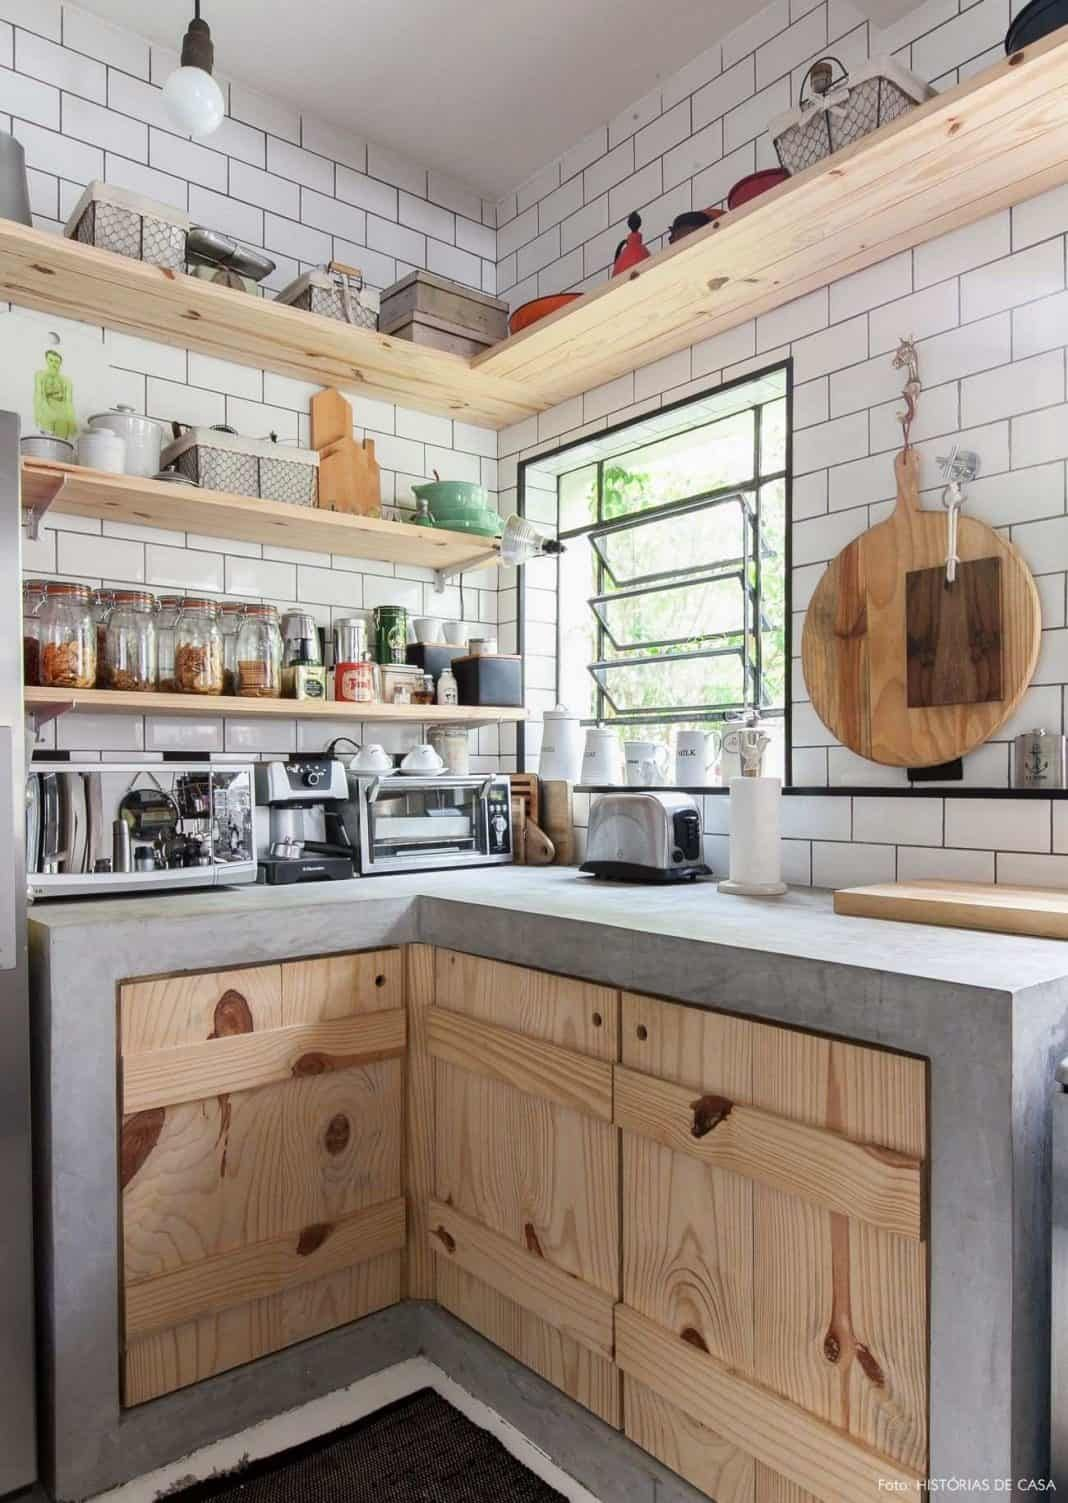 333 Small Kitchen Ideas, Organization, and Kitchen Designs